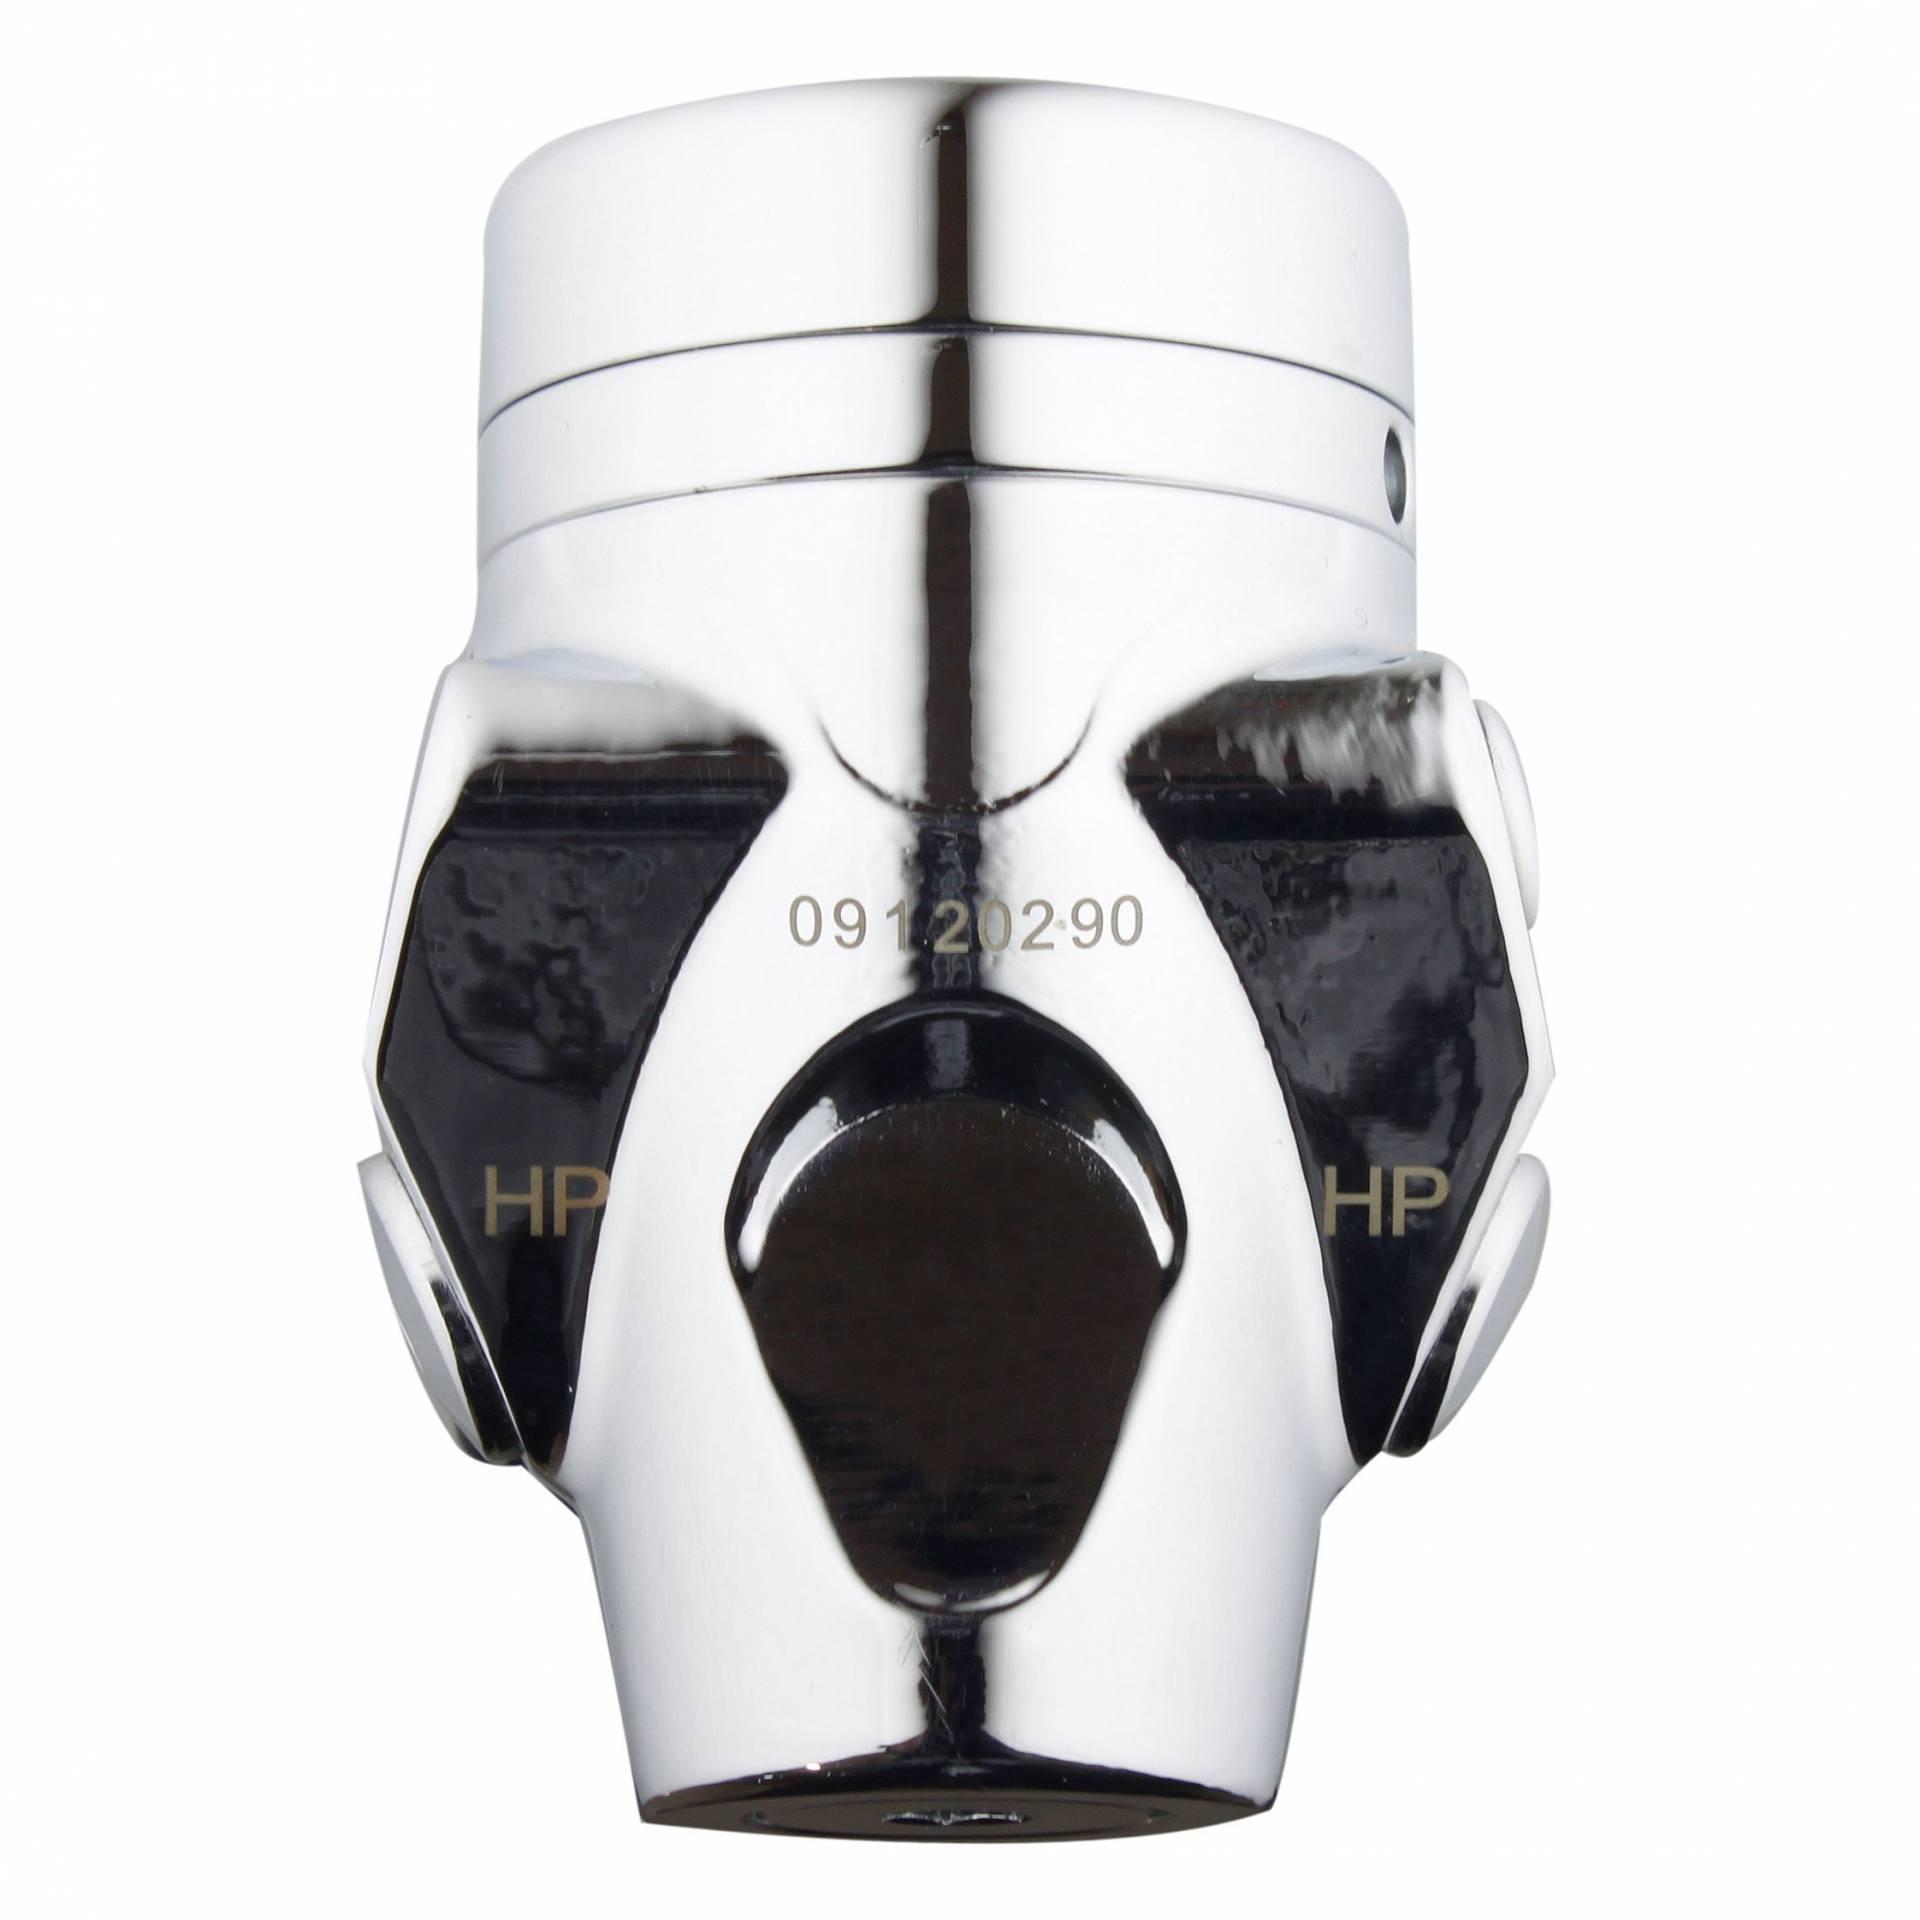 Scuba First Stage Balanced Diaphragm Regulators (DIN) - RG-4100F Scuba Diving Balanced First Stage (ICE-DIN)